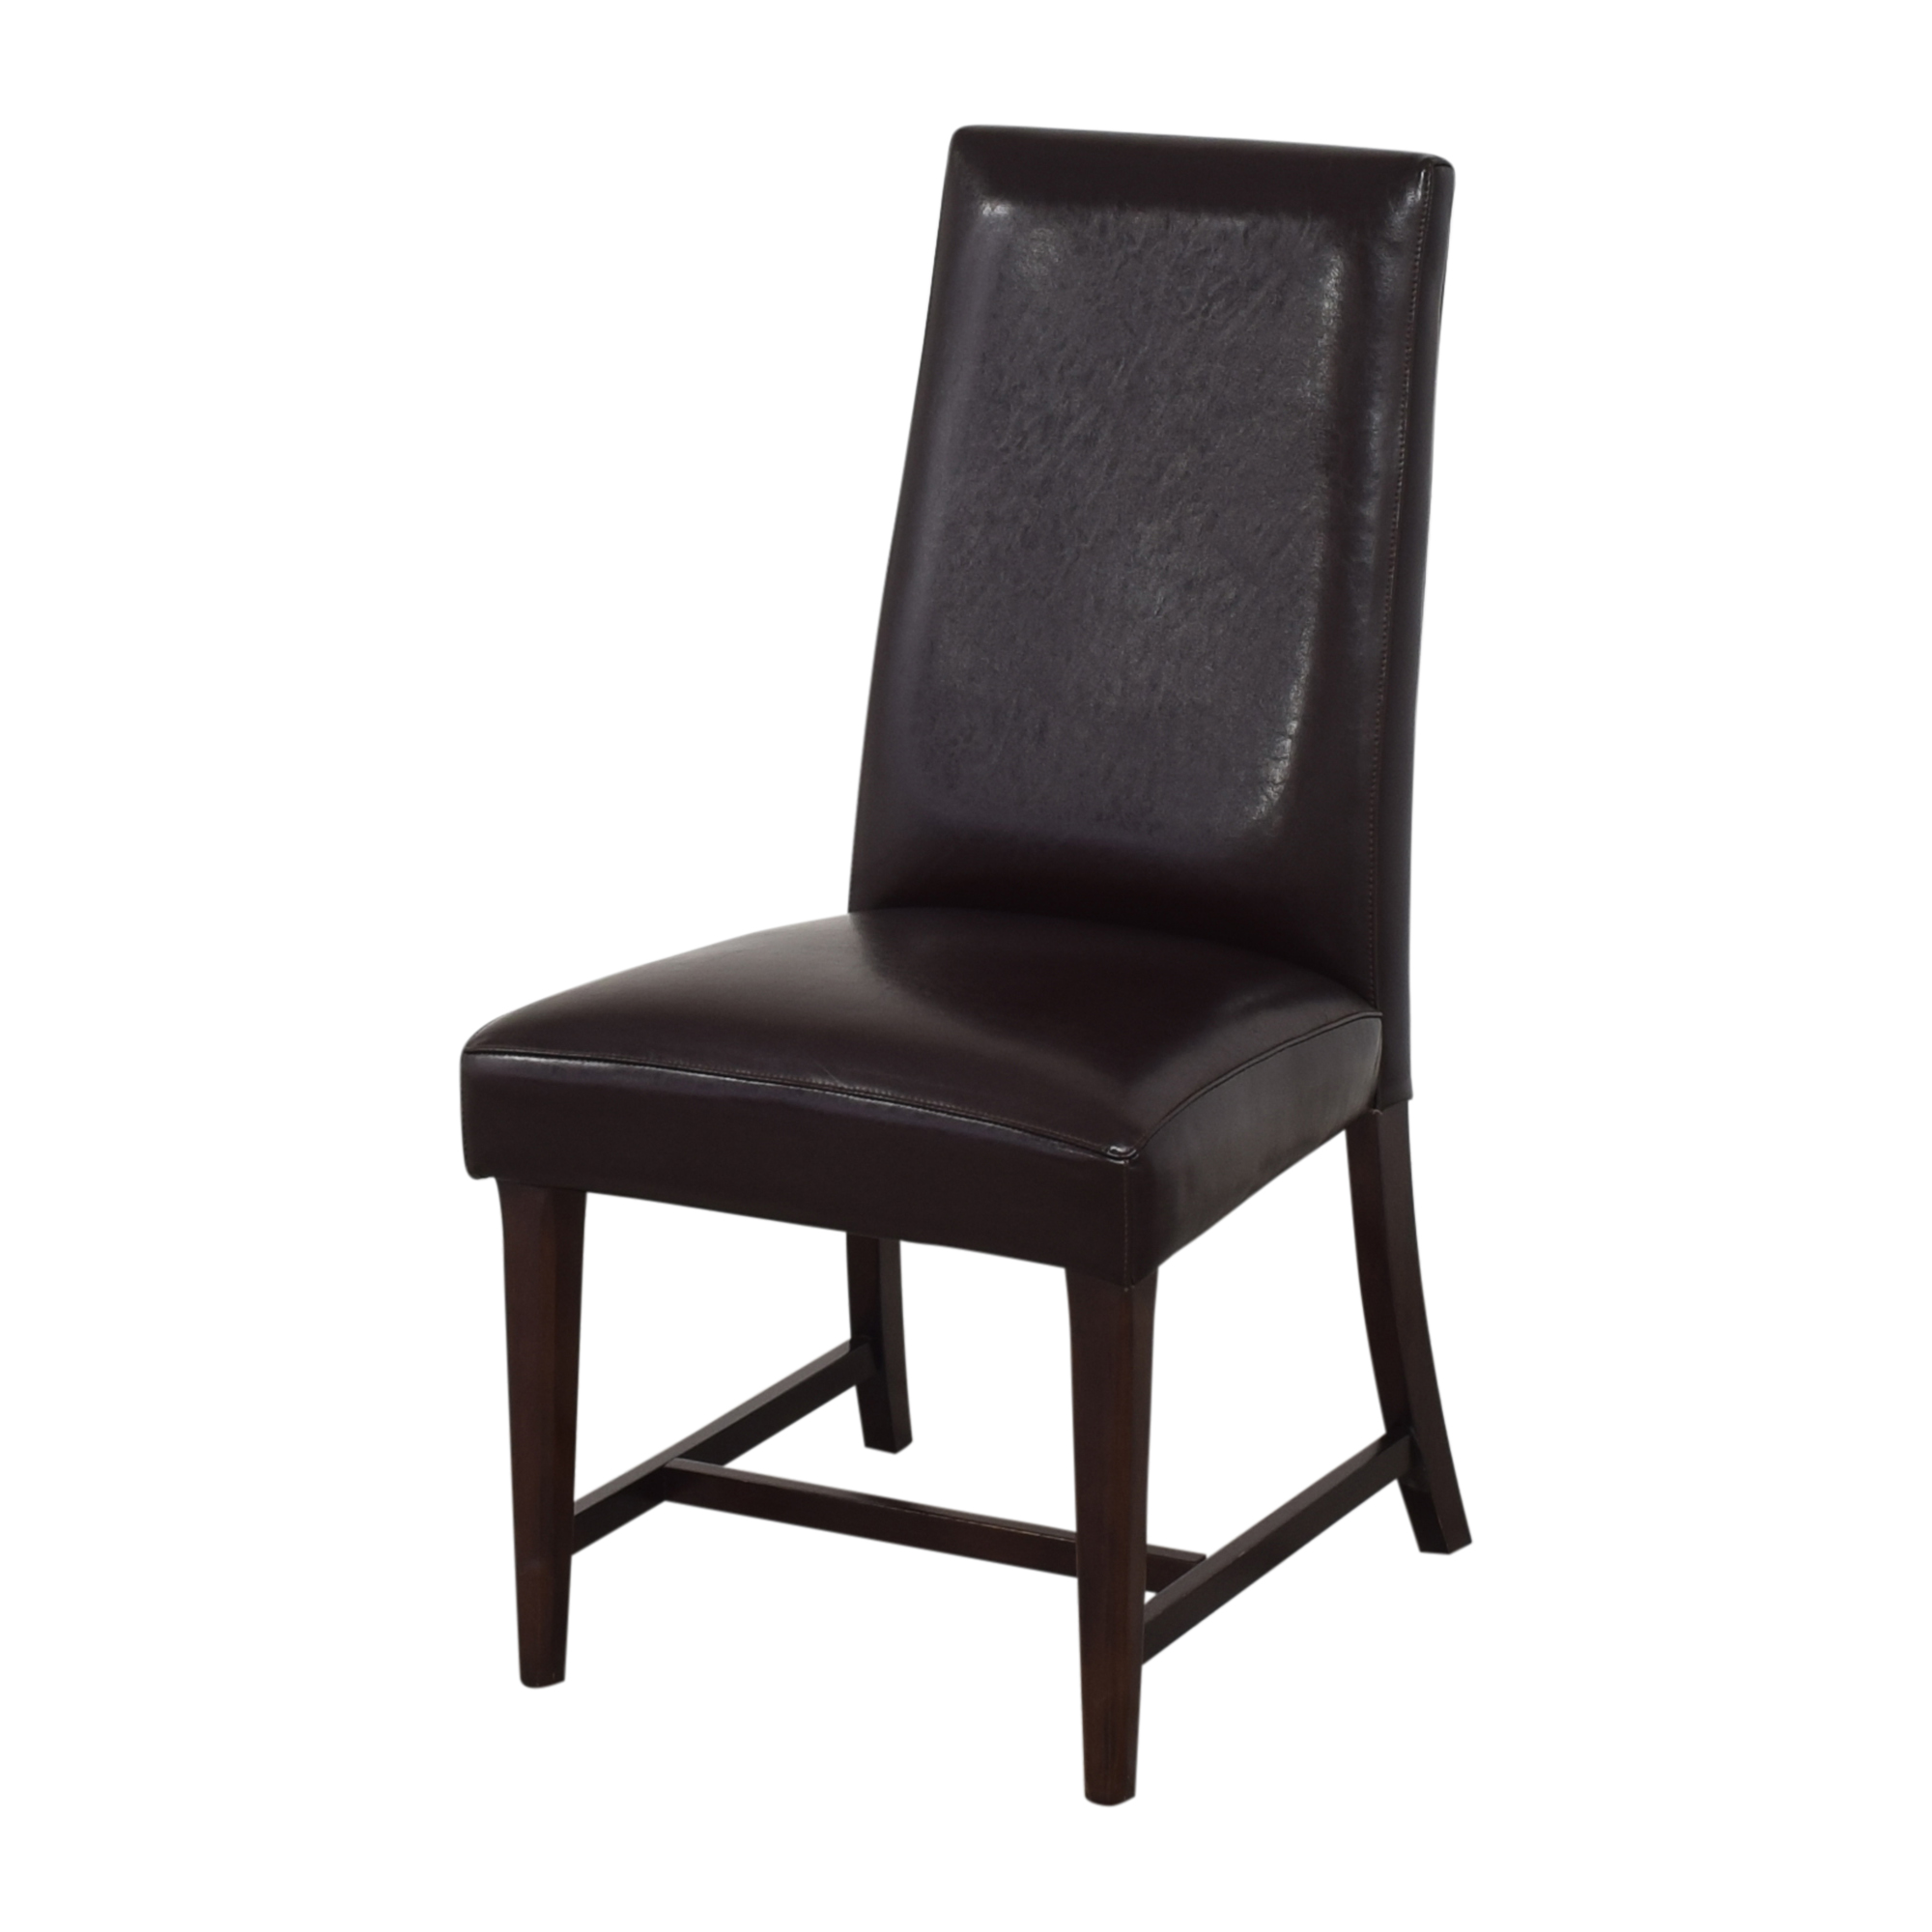 buy Shermag High Back Dining Chairs Shermag